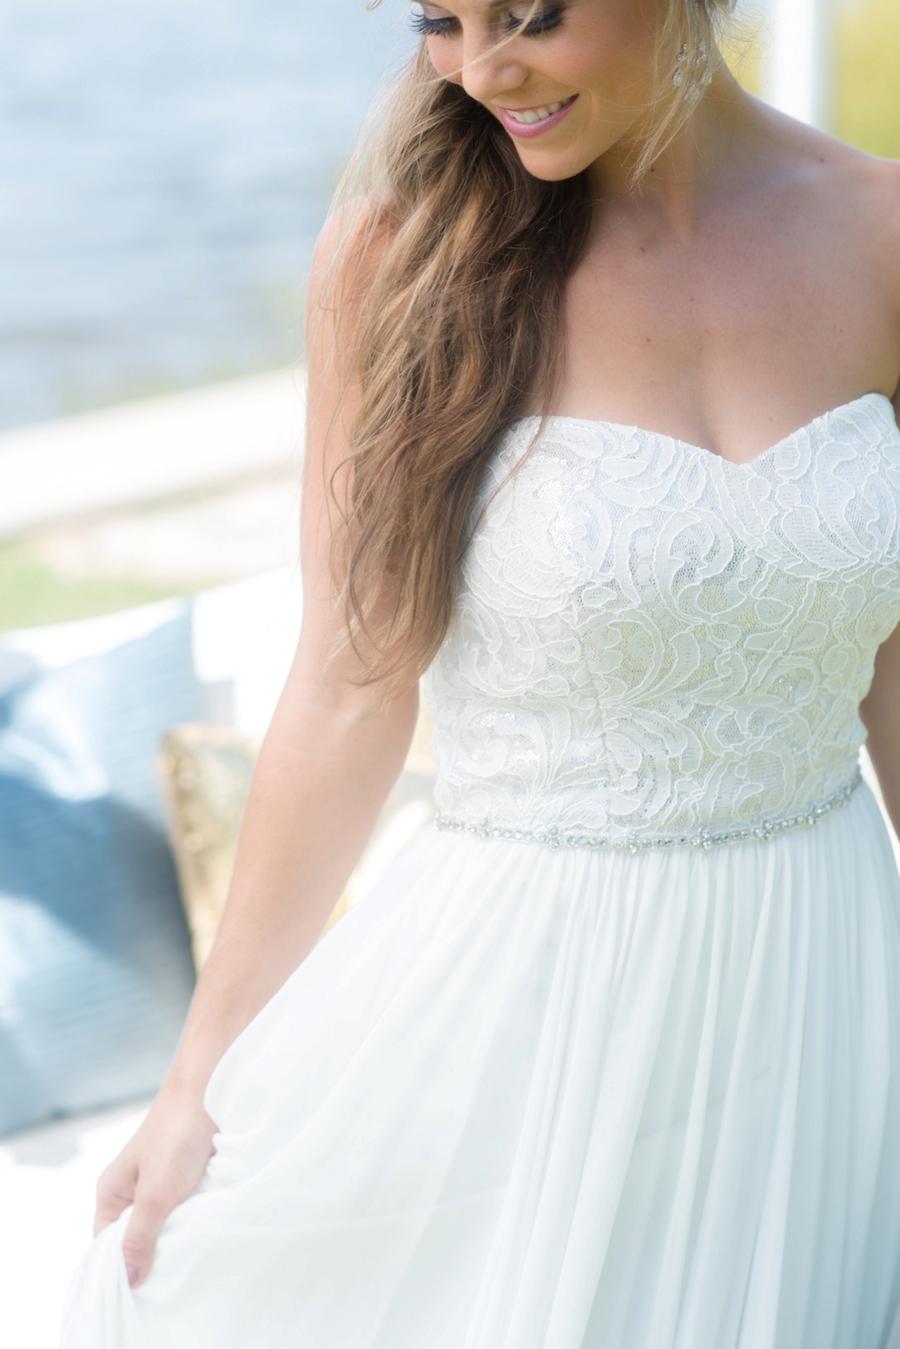 Bridal Beach Wedding Portrait in Strapless Chiffon Dessy Wedding Dress| St. Pete Wedding Photographer, Caroline & Evan Photography